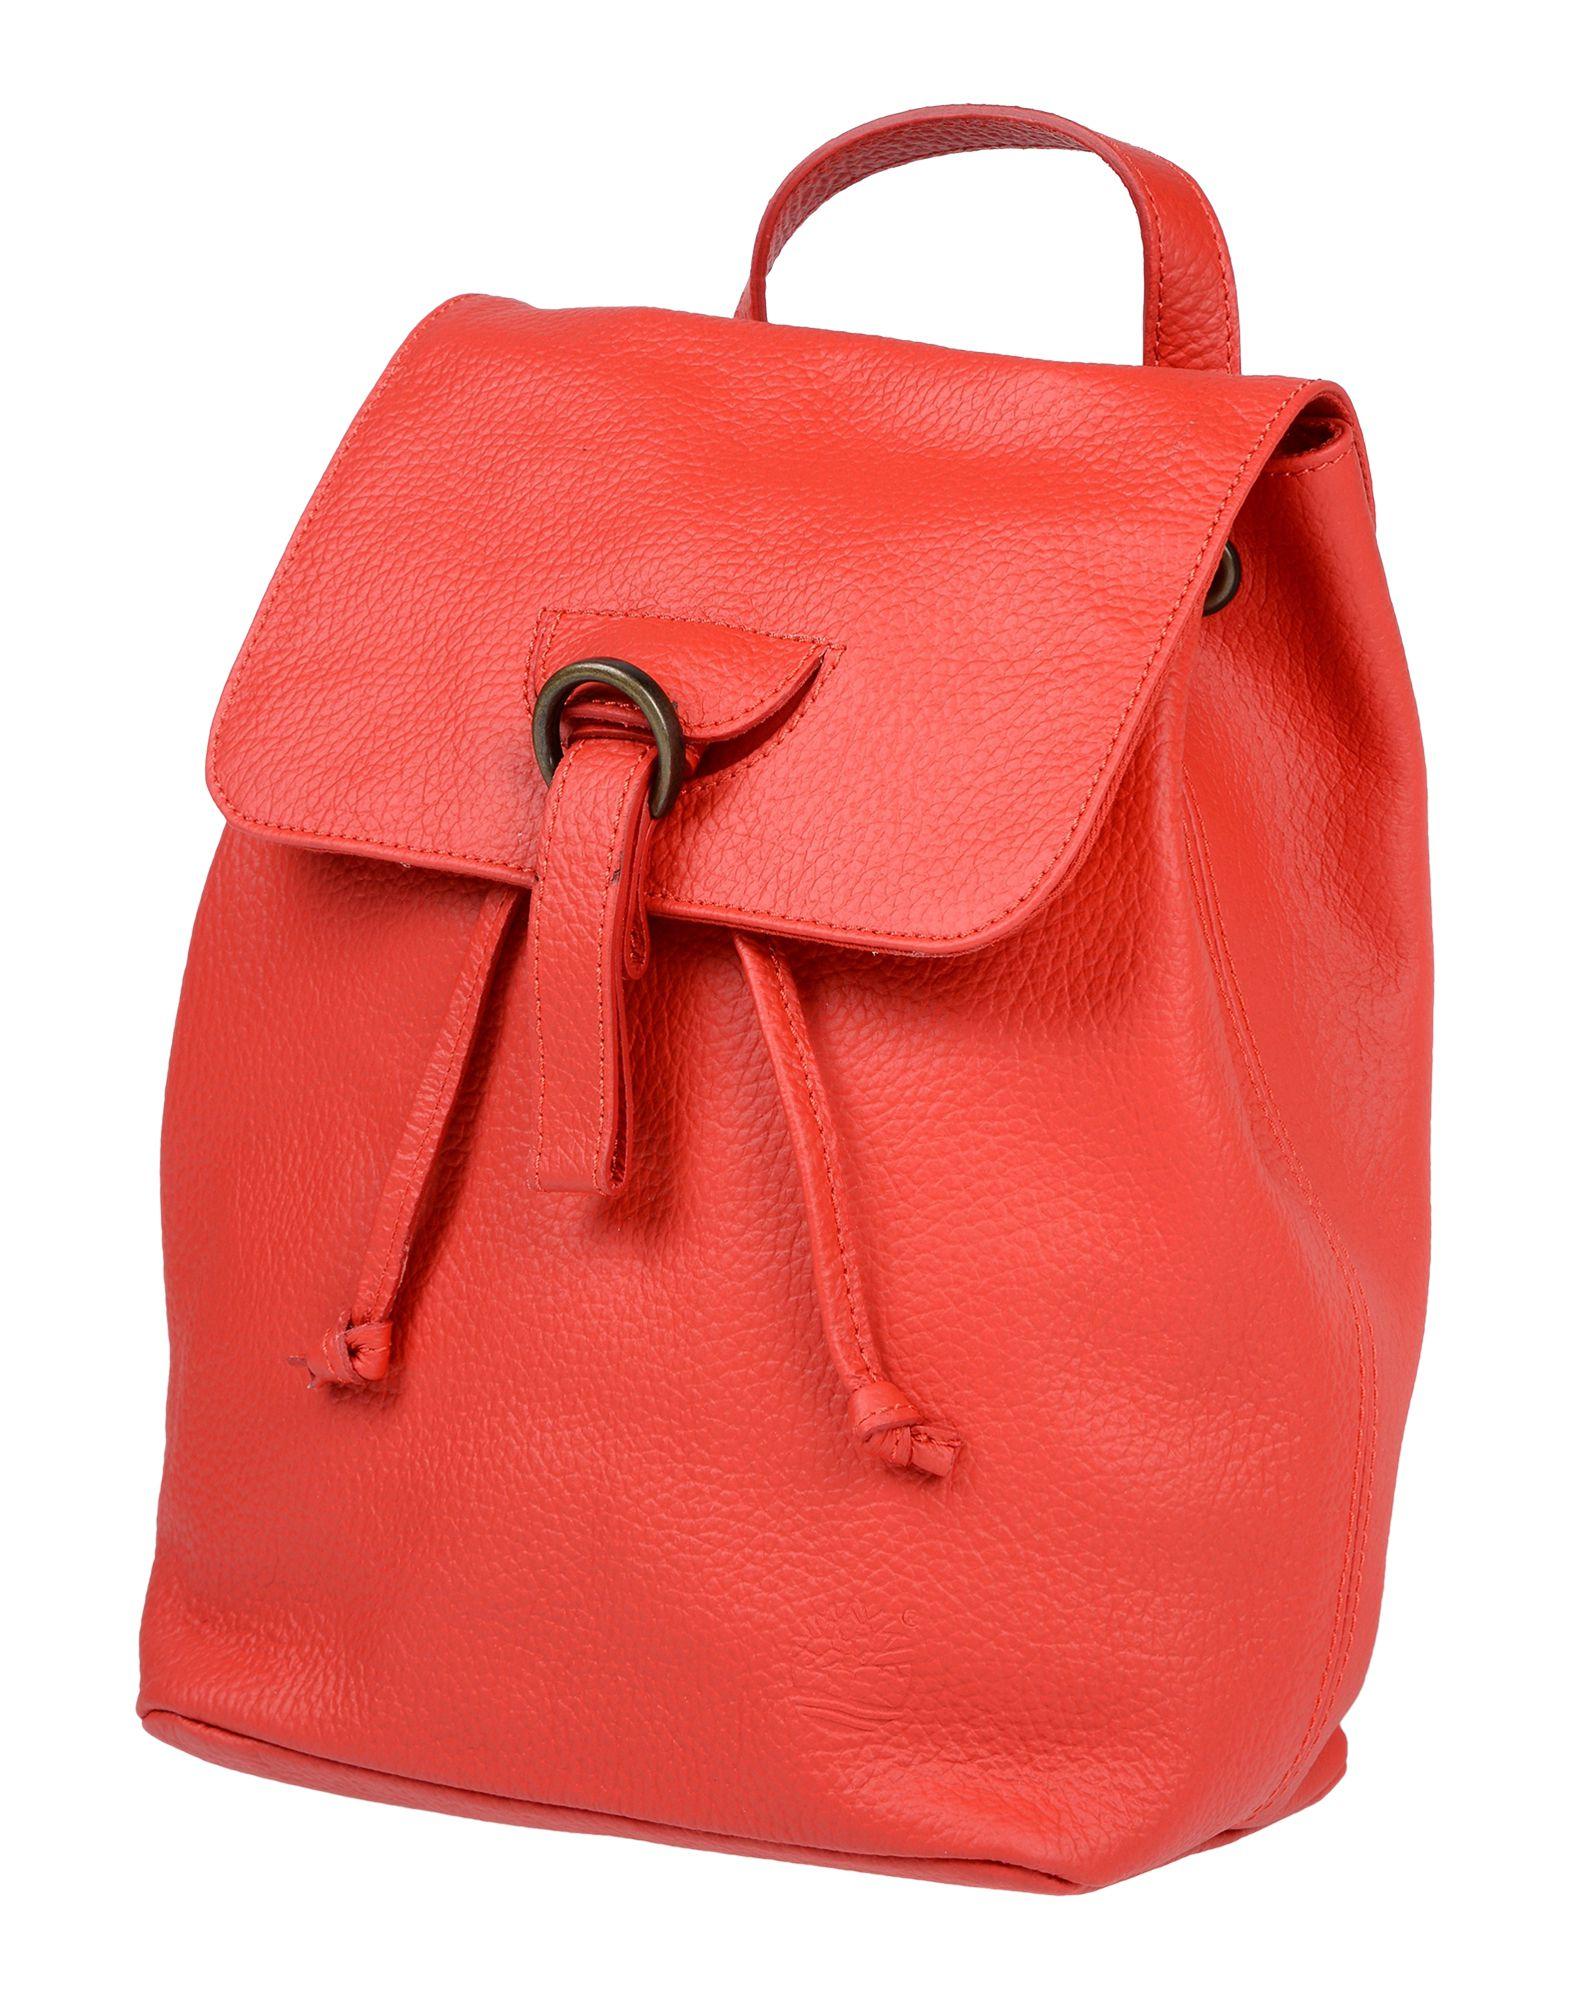 4e22018c61 Timberland Backpack & Fanny Pack - Women Timberland Backpacks ...